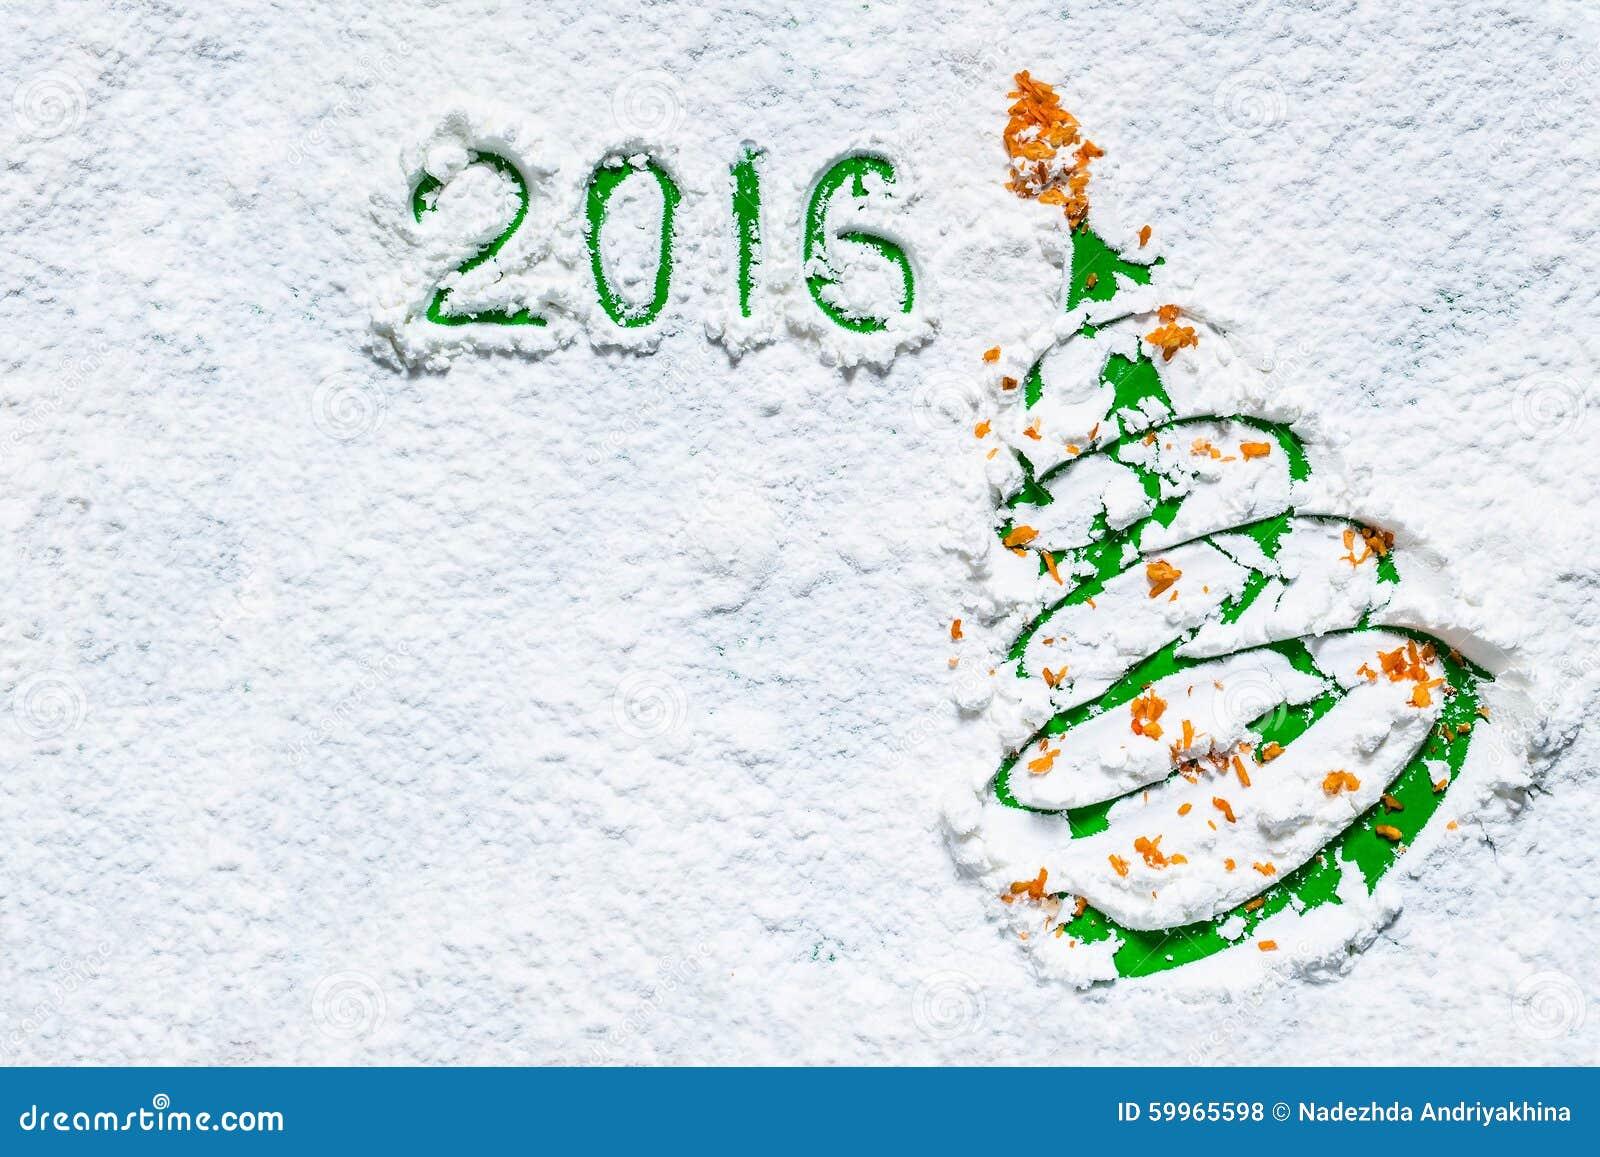 Idea Design Christmas Cards - Christmas Tree In The Snow Stock Photo ...